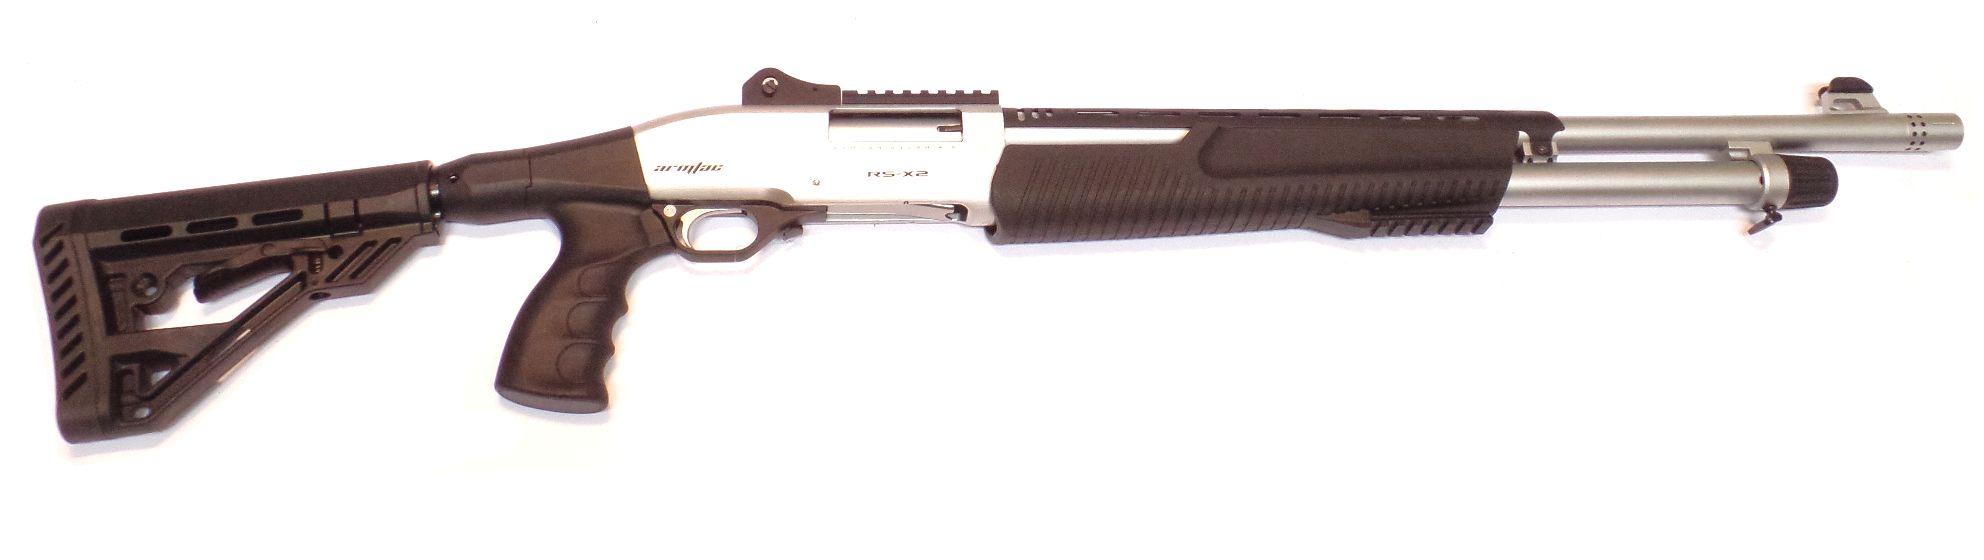 ARMSAN RSX2 MARINE Fusil à pompe canon rayé calibre 12/76